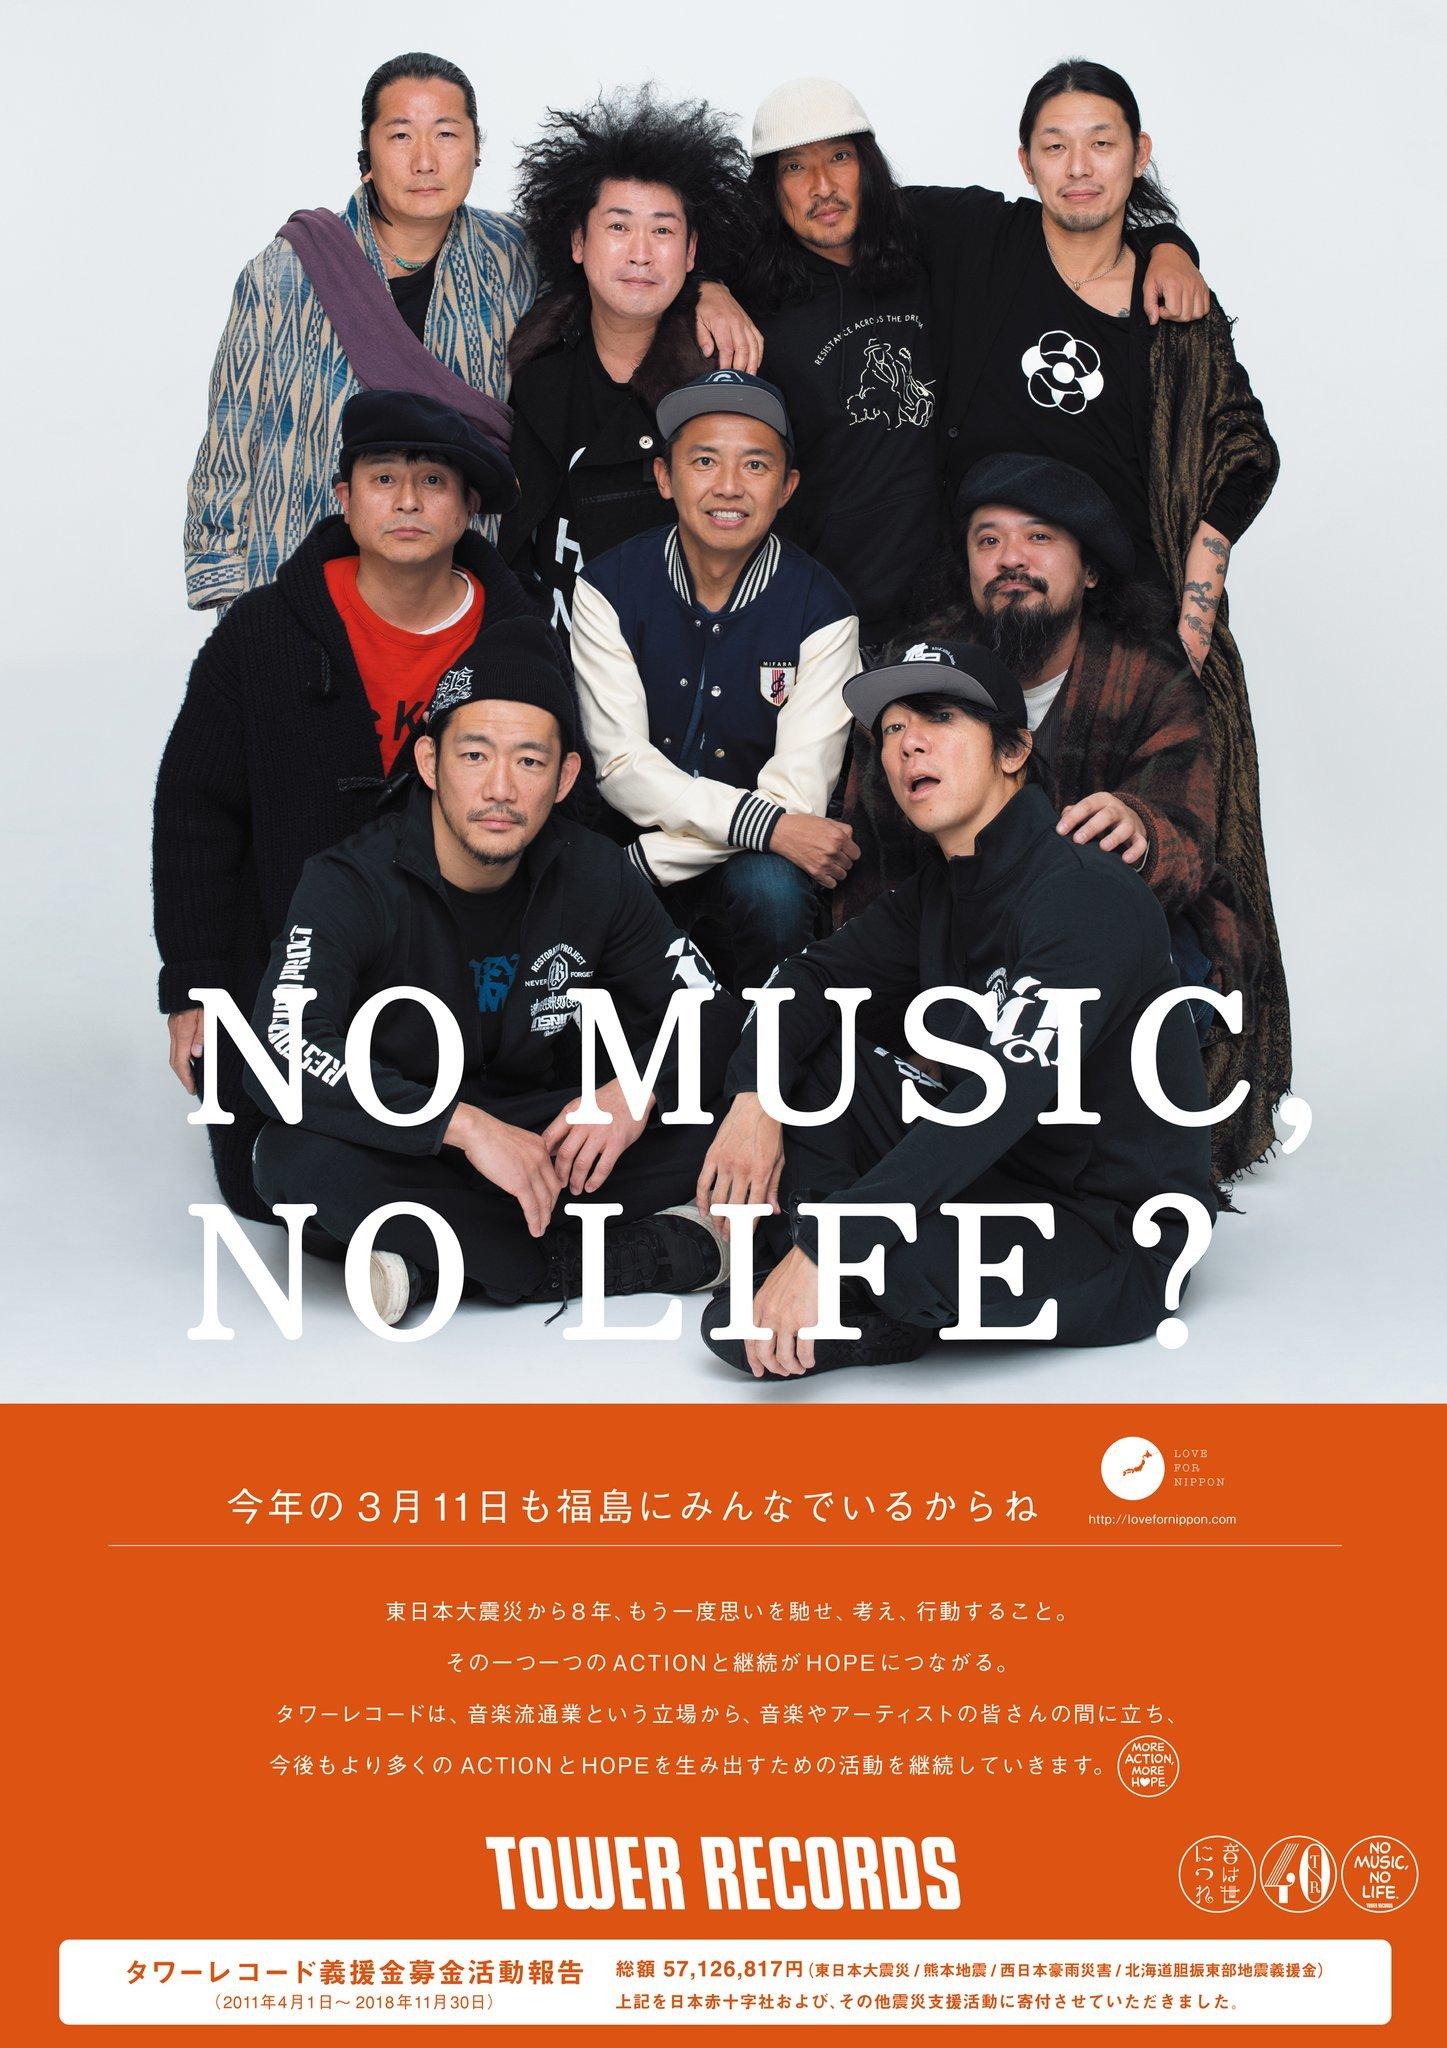 『NO MUSIC, NO LIFE.』MORE ACTION, MORE HOPE. 版ポスターは、タワーレコードおよびTOWERmini全店にて3月1日(金)より順次掲出されます!_e0056646_08351958.jpg